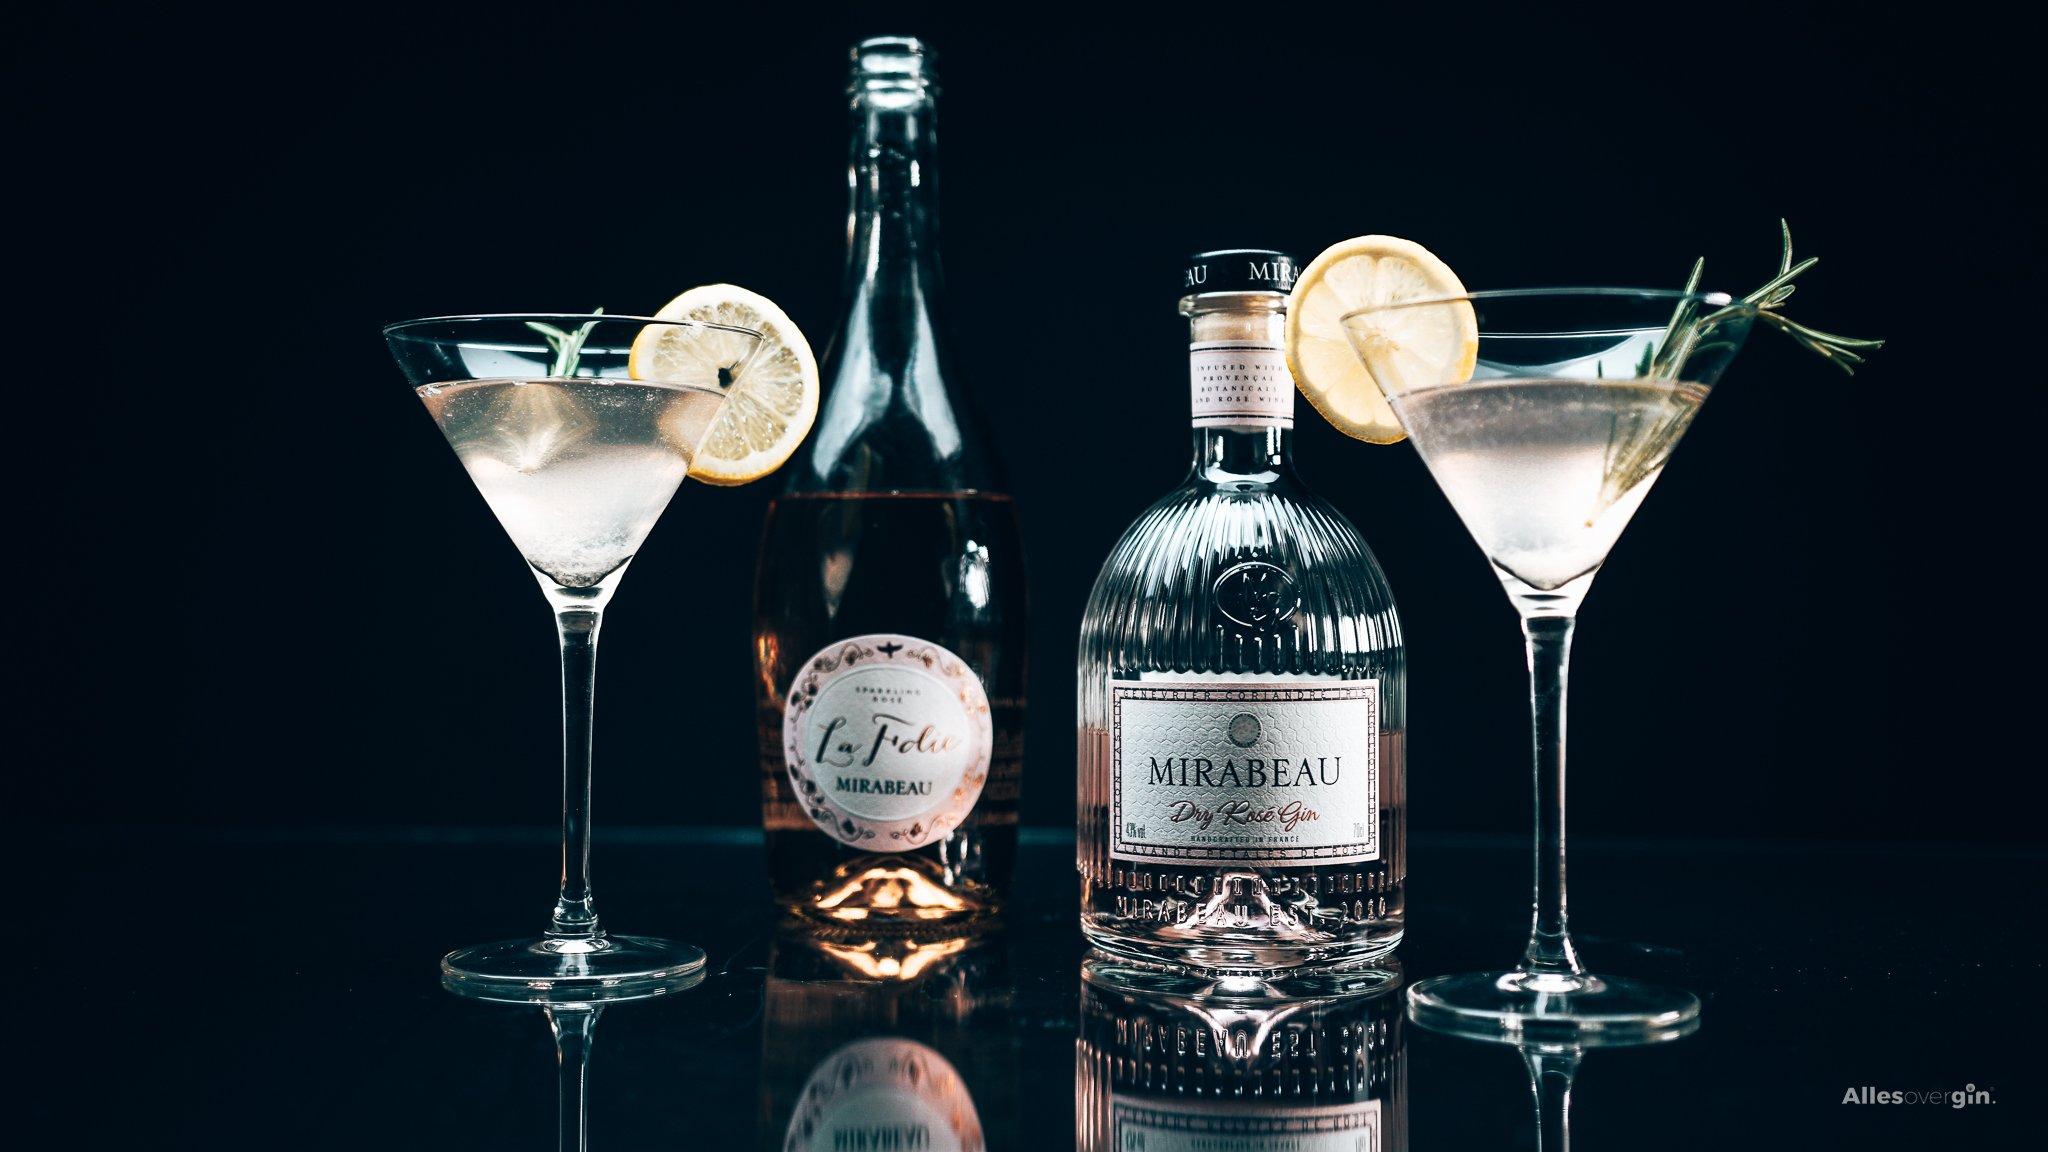 Gin cocktail recept, Mirabeau Dry Rosé Gin, Mirabeau's Gin Fizz, Alles over gin.